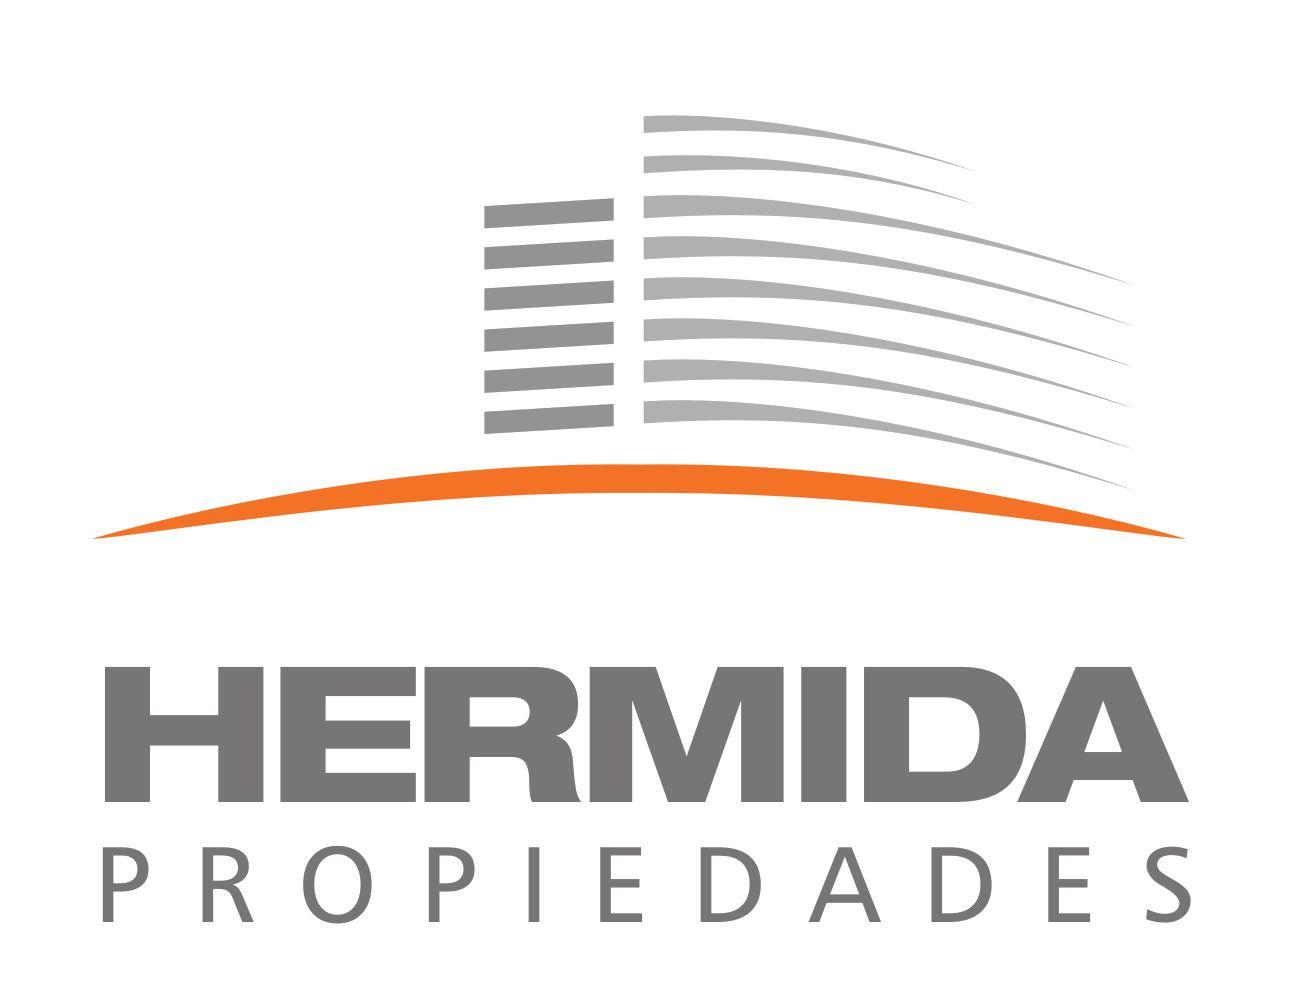 Logo de  Hermidainmuebles